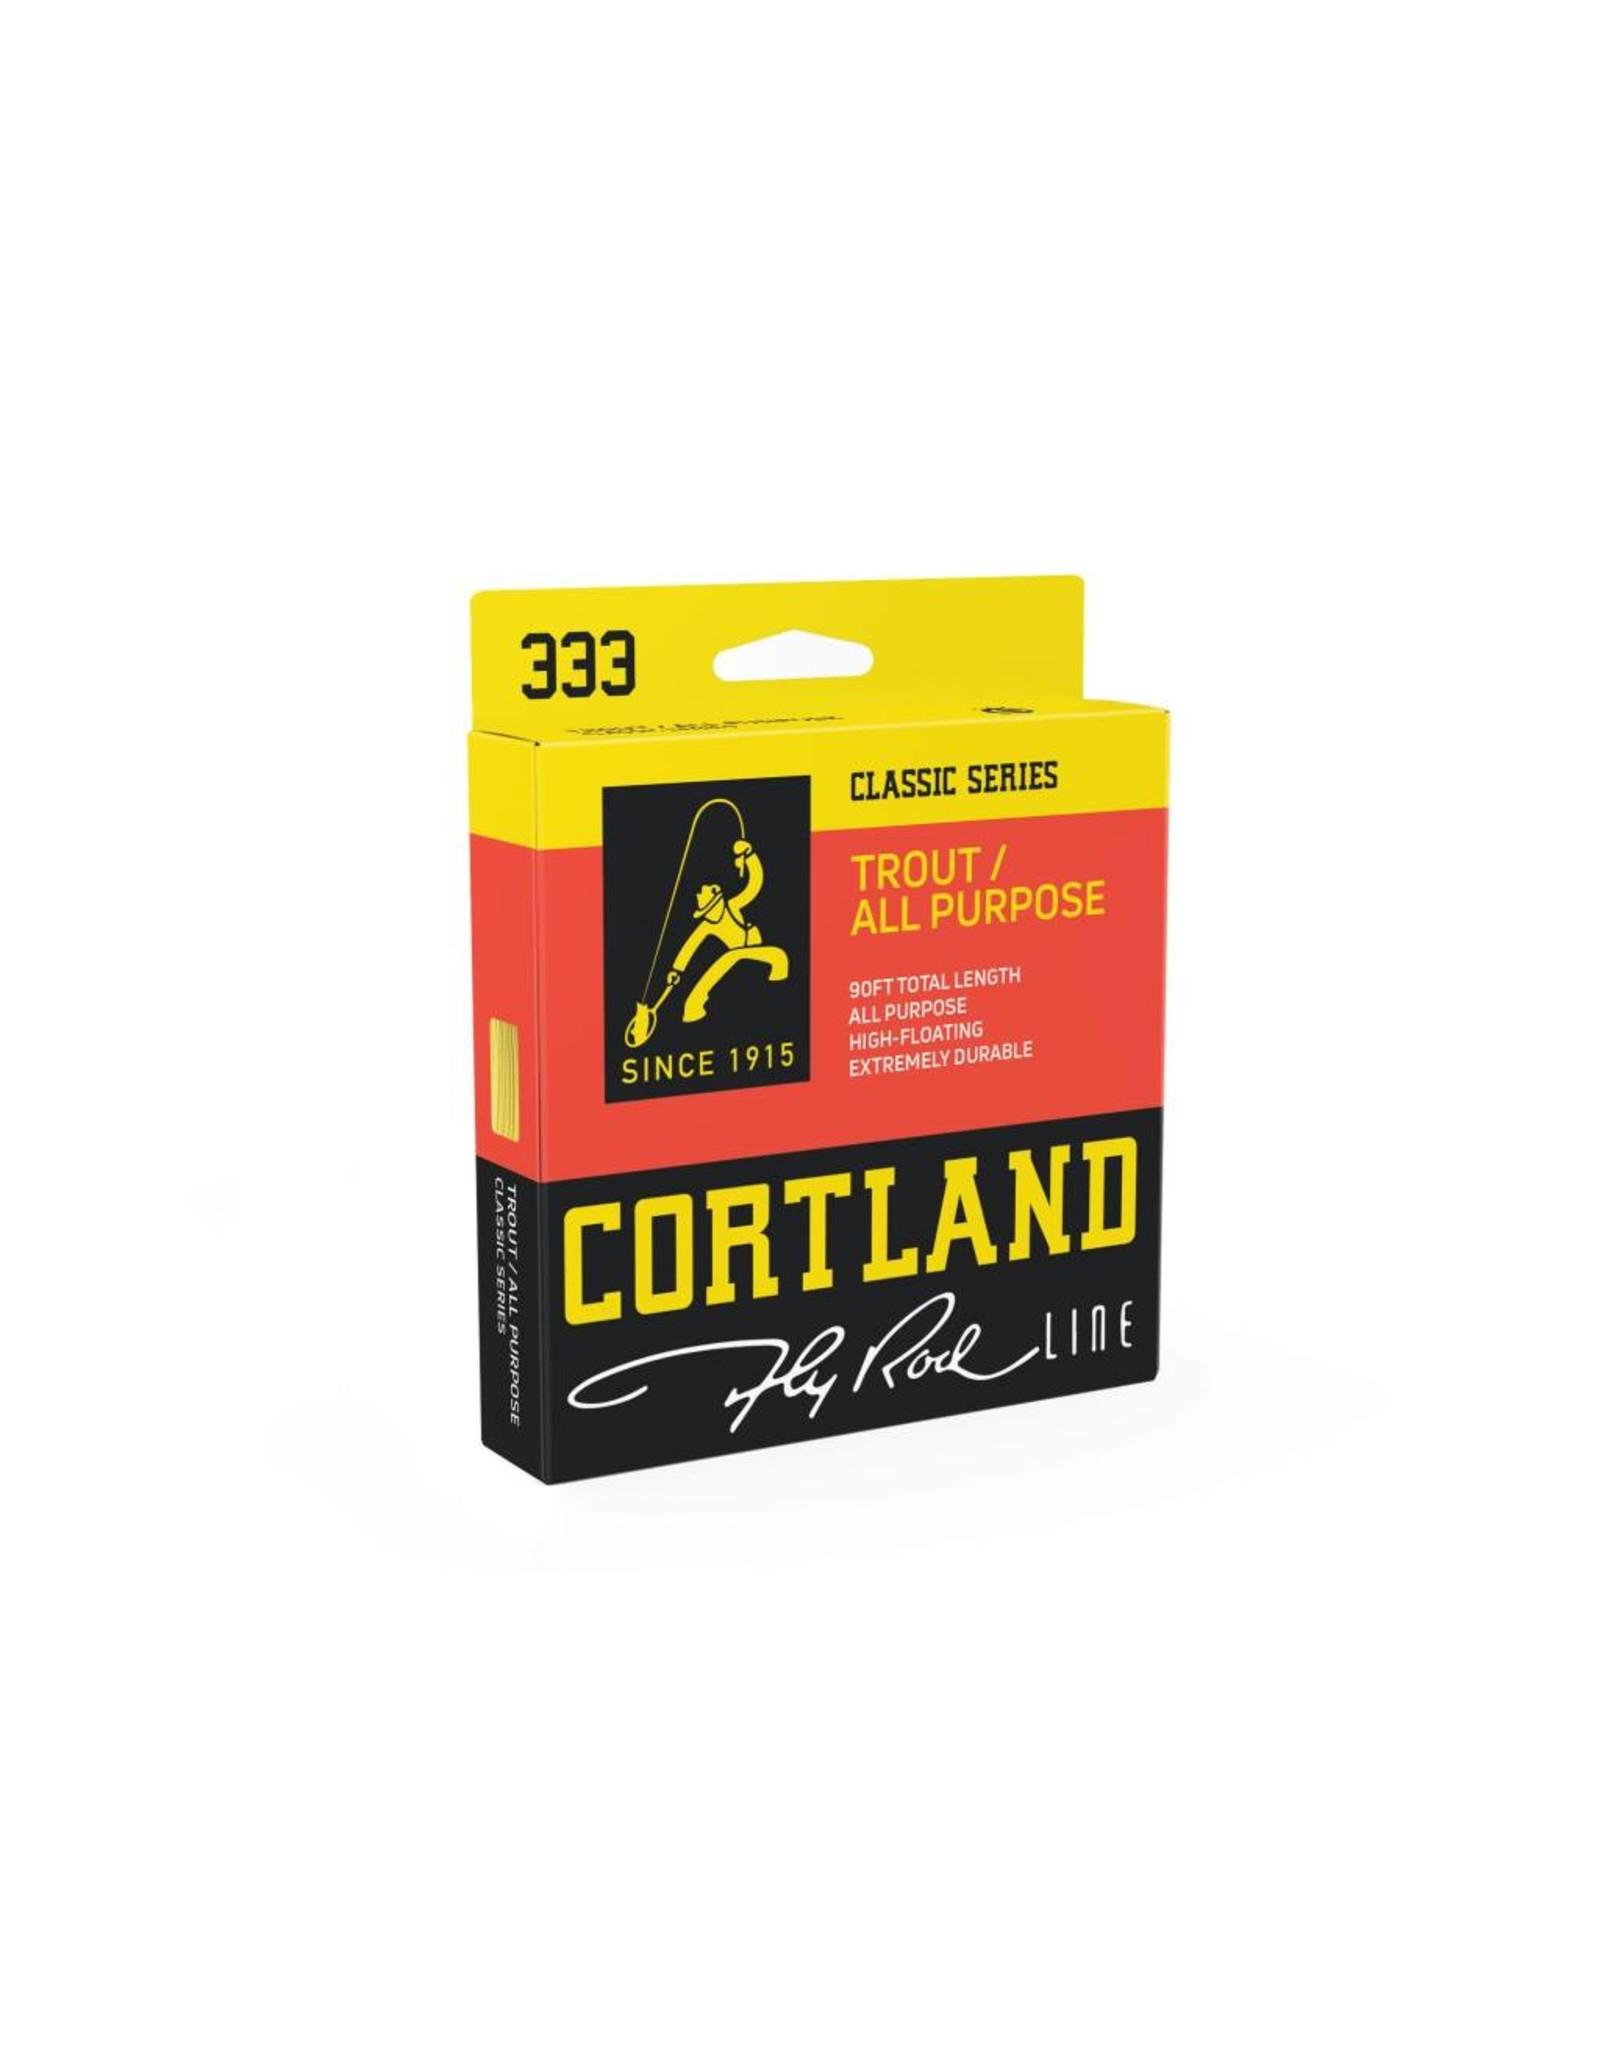 Cortland Cortland 333 Classic WF